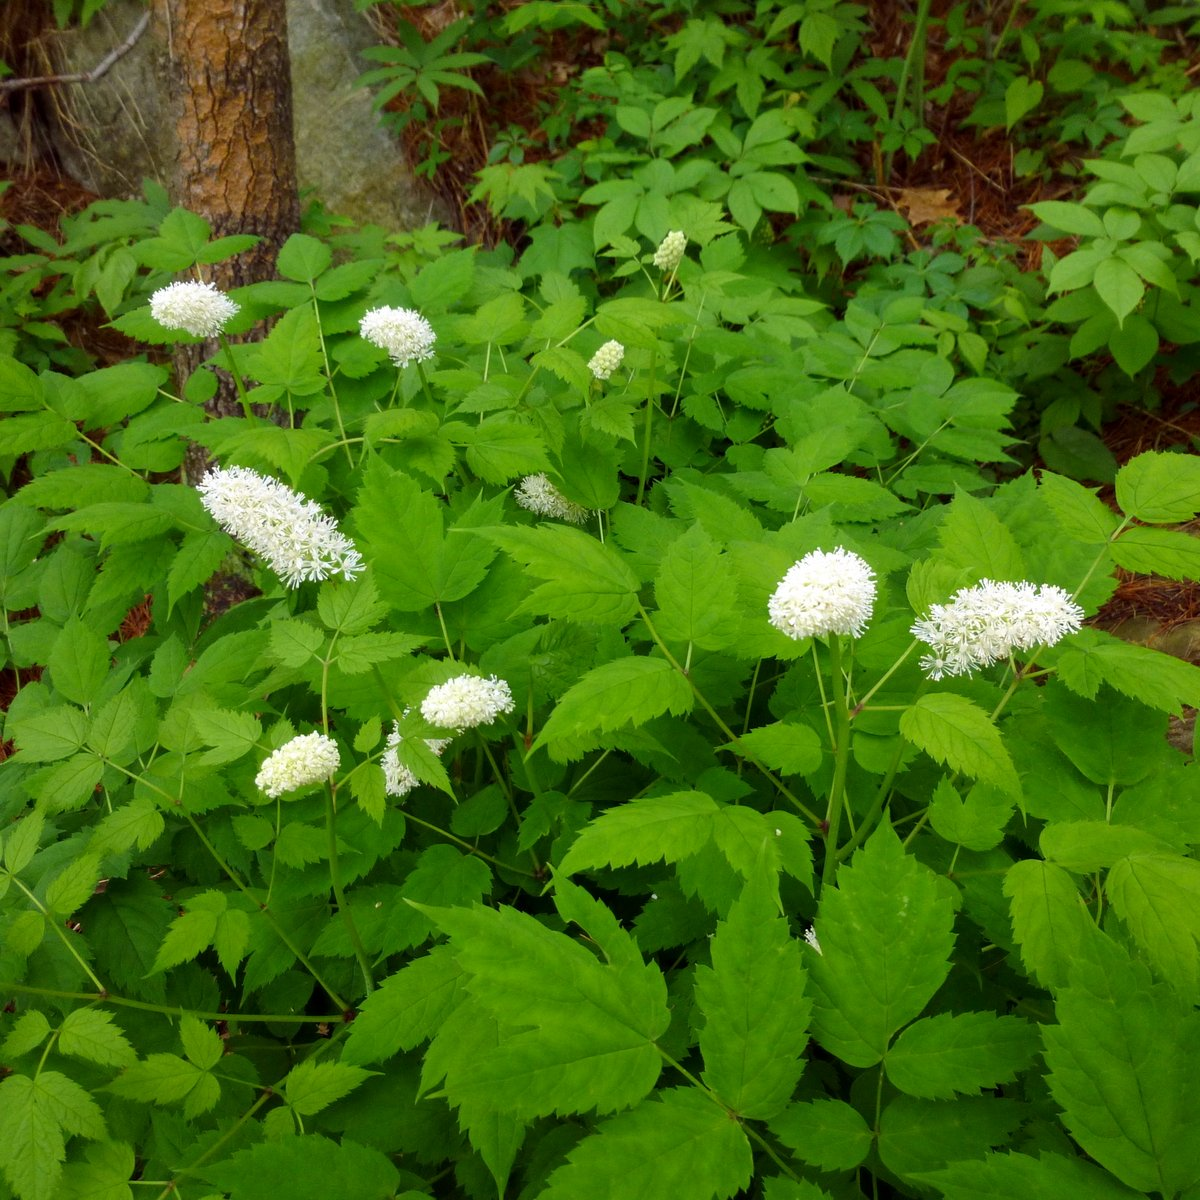 12. White Baneberry Plants